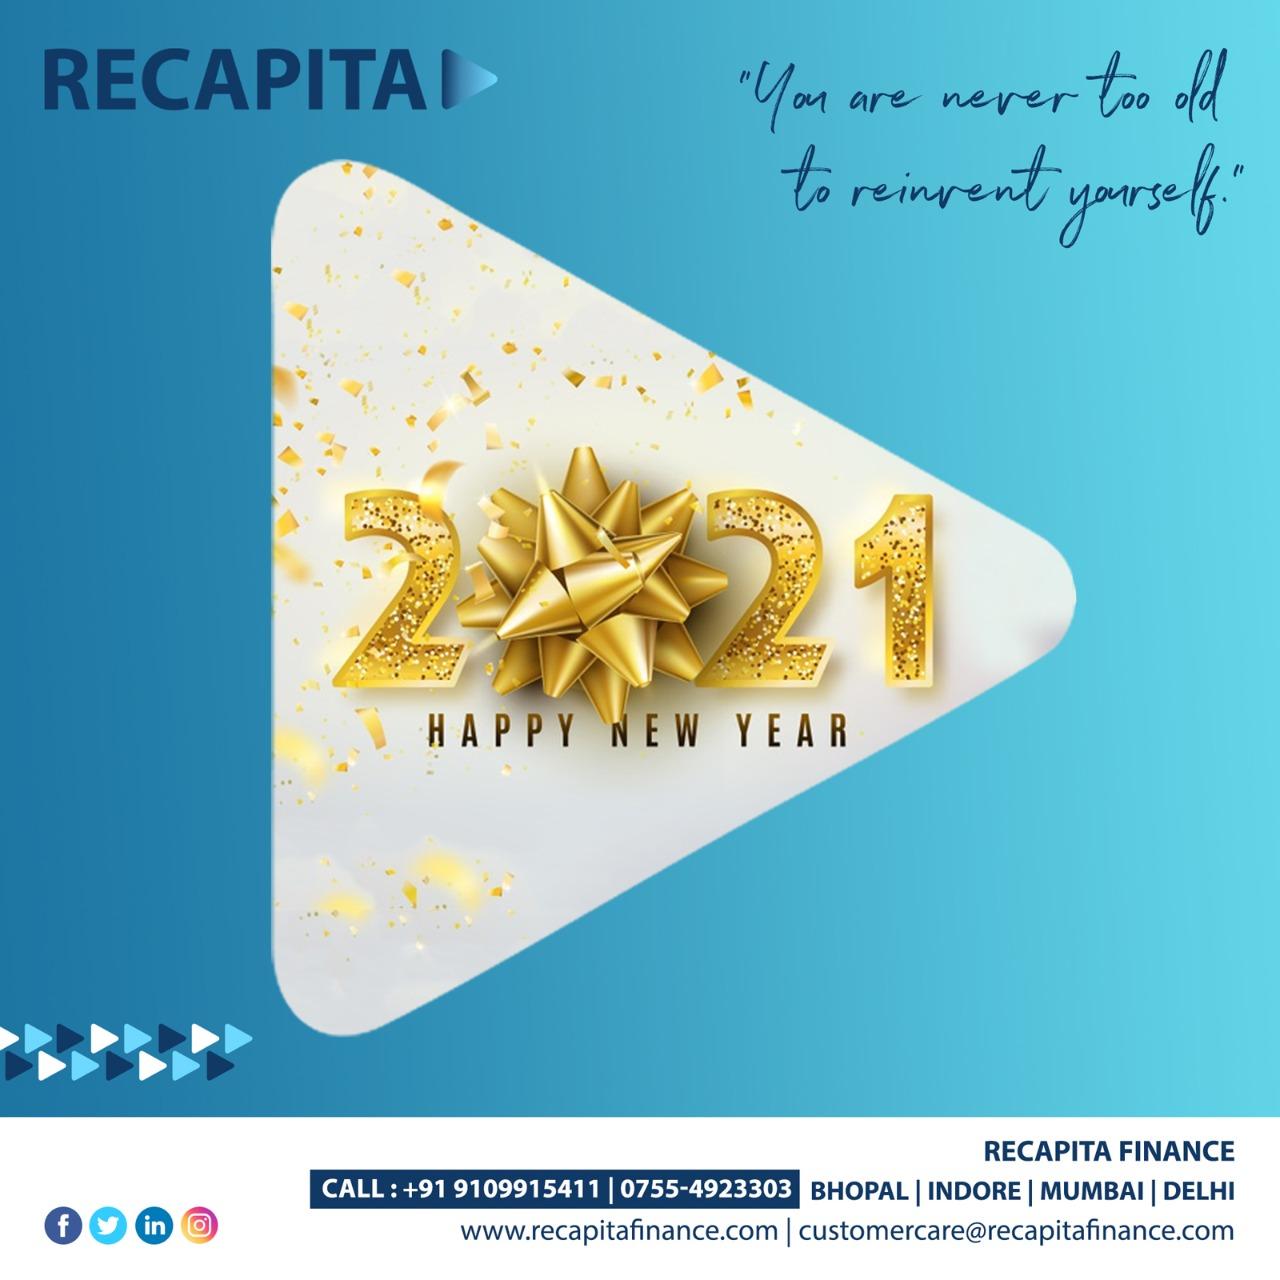 recapita_happy_new_year_2021.jpg